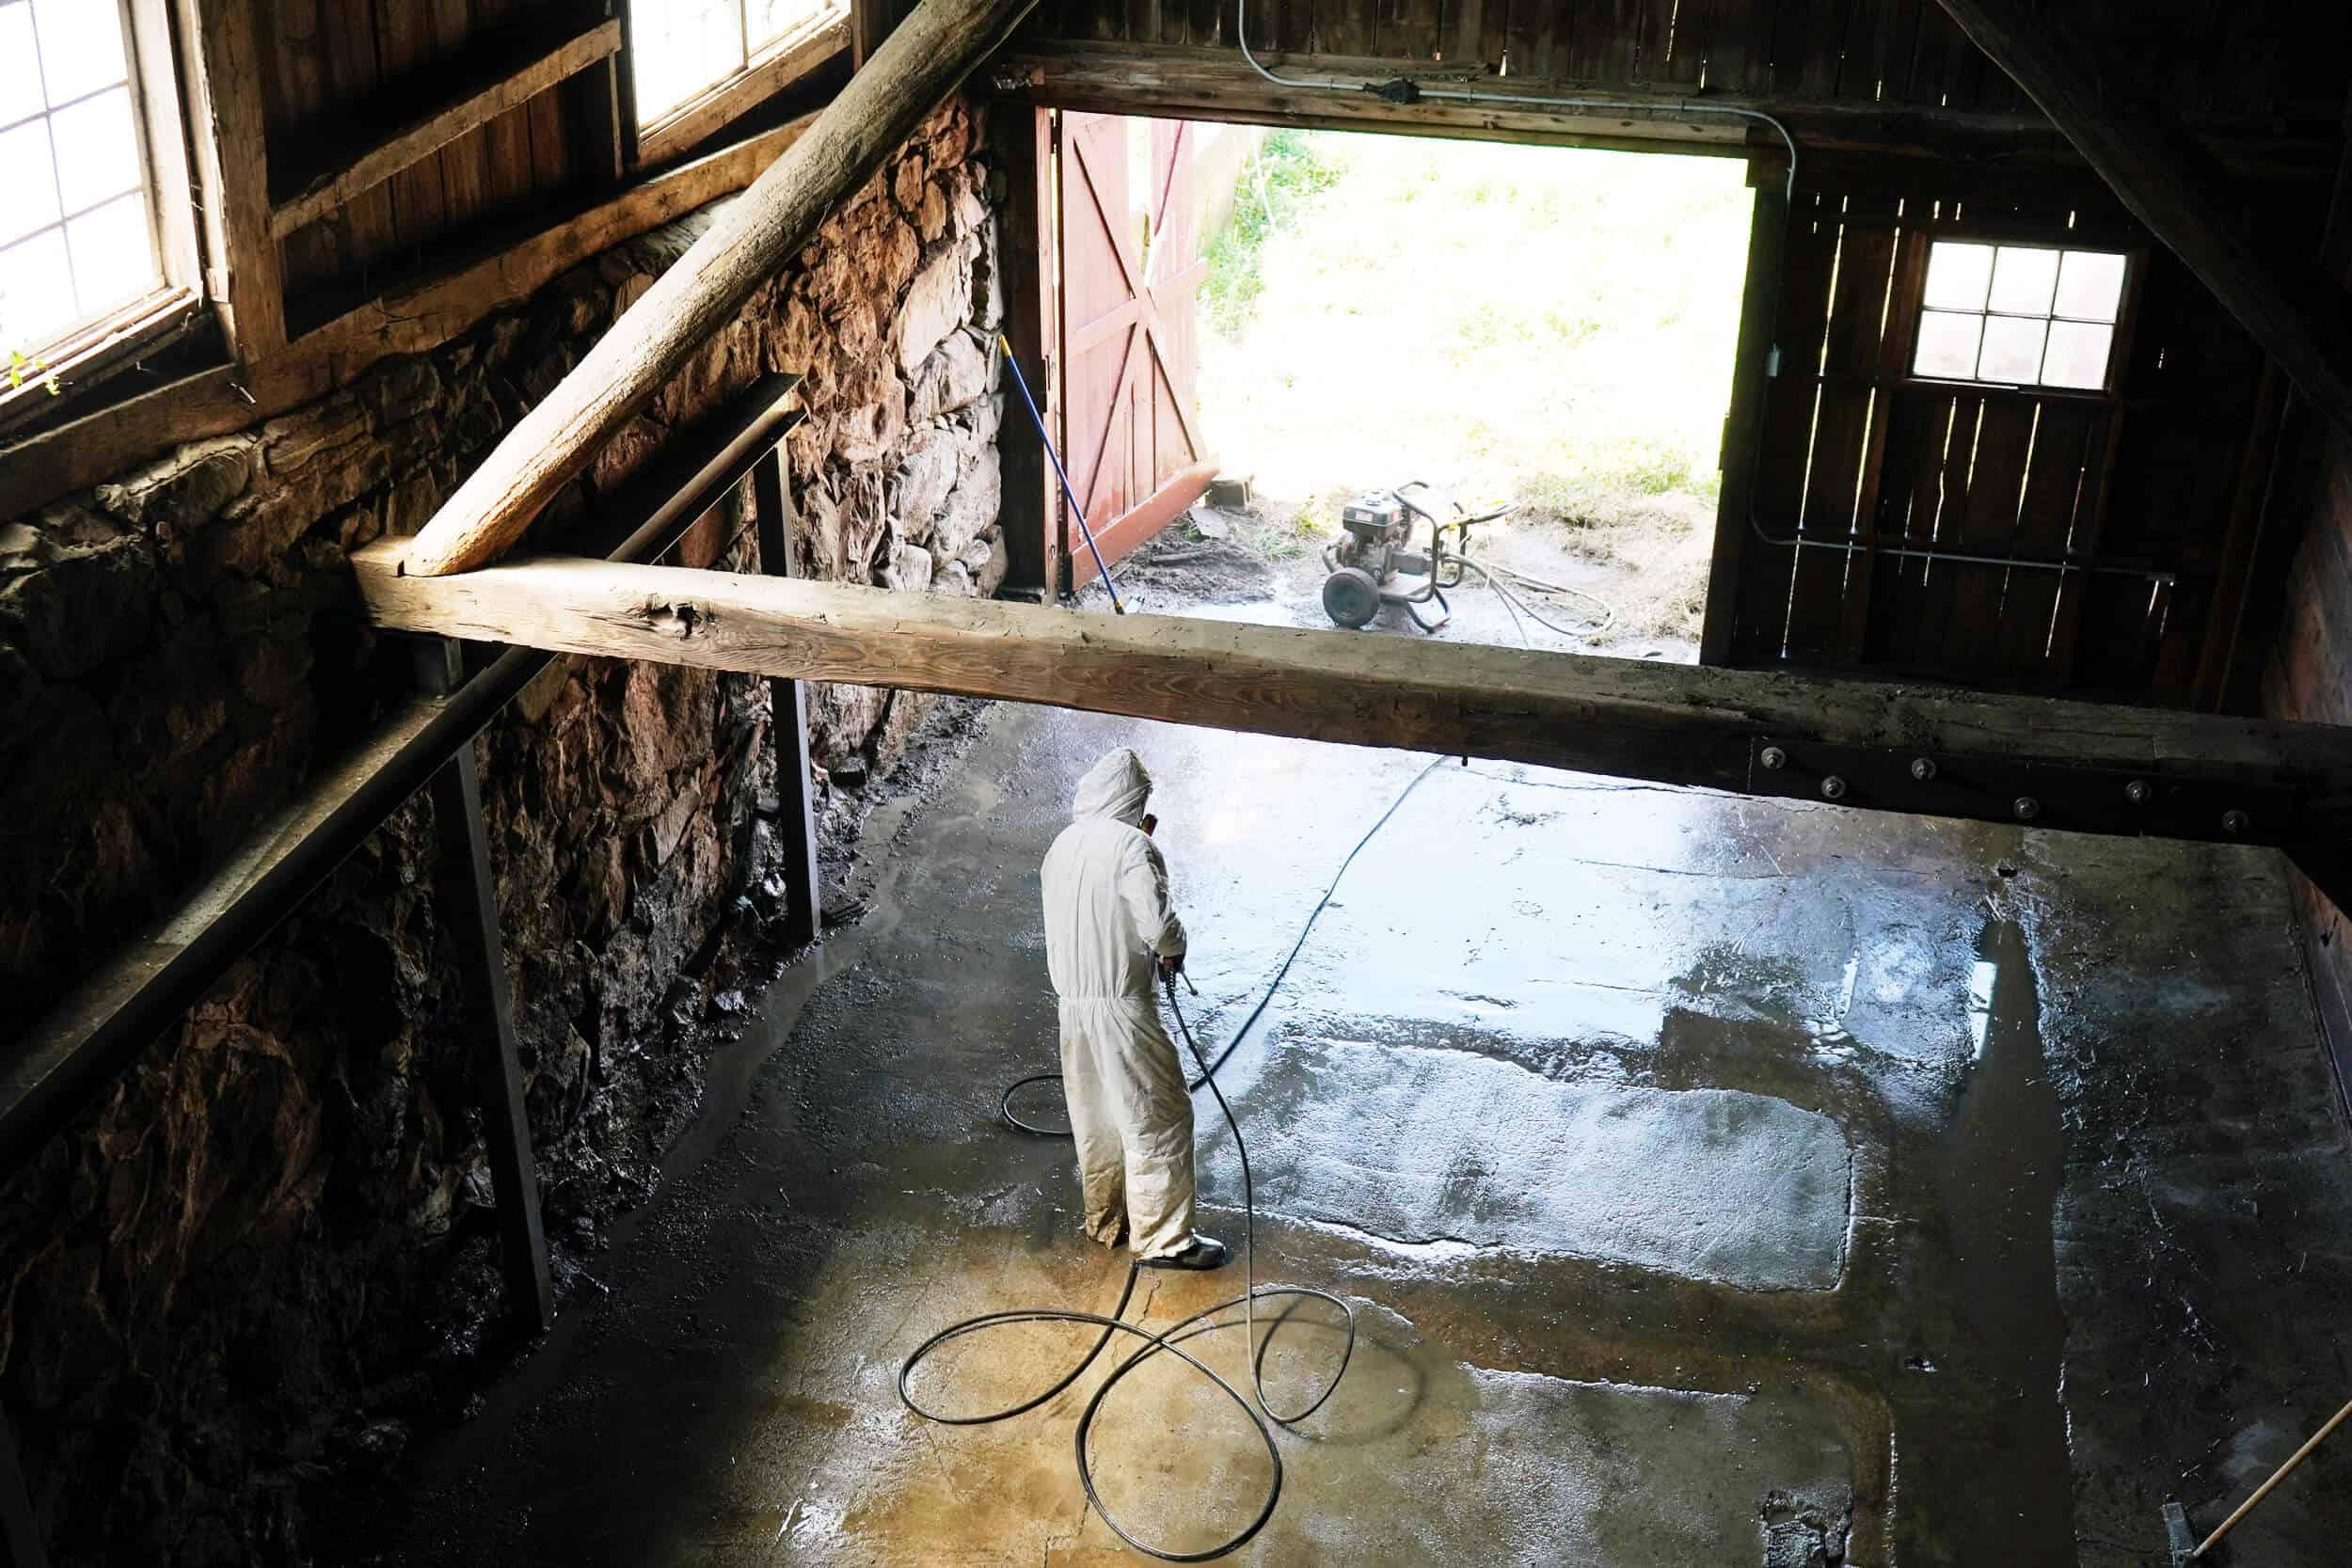 Emily Henderson Samsung The Frame Louise Roe The Barn 03 Edited